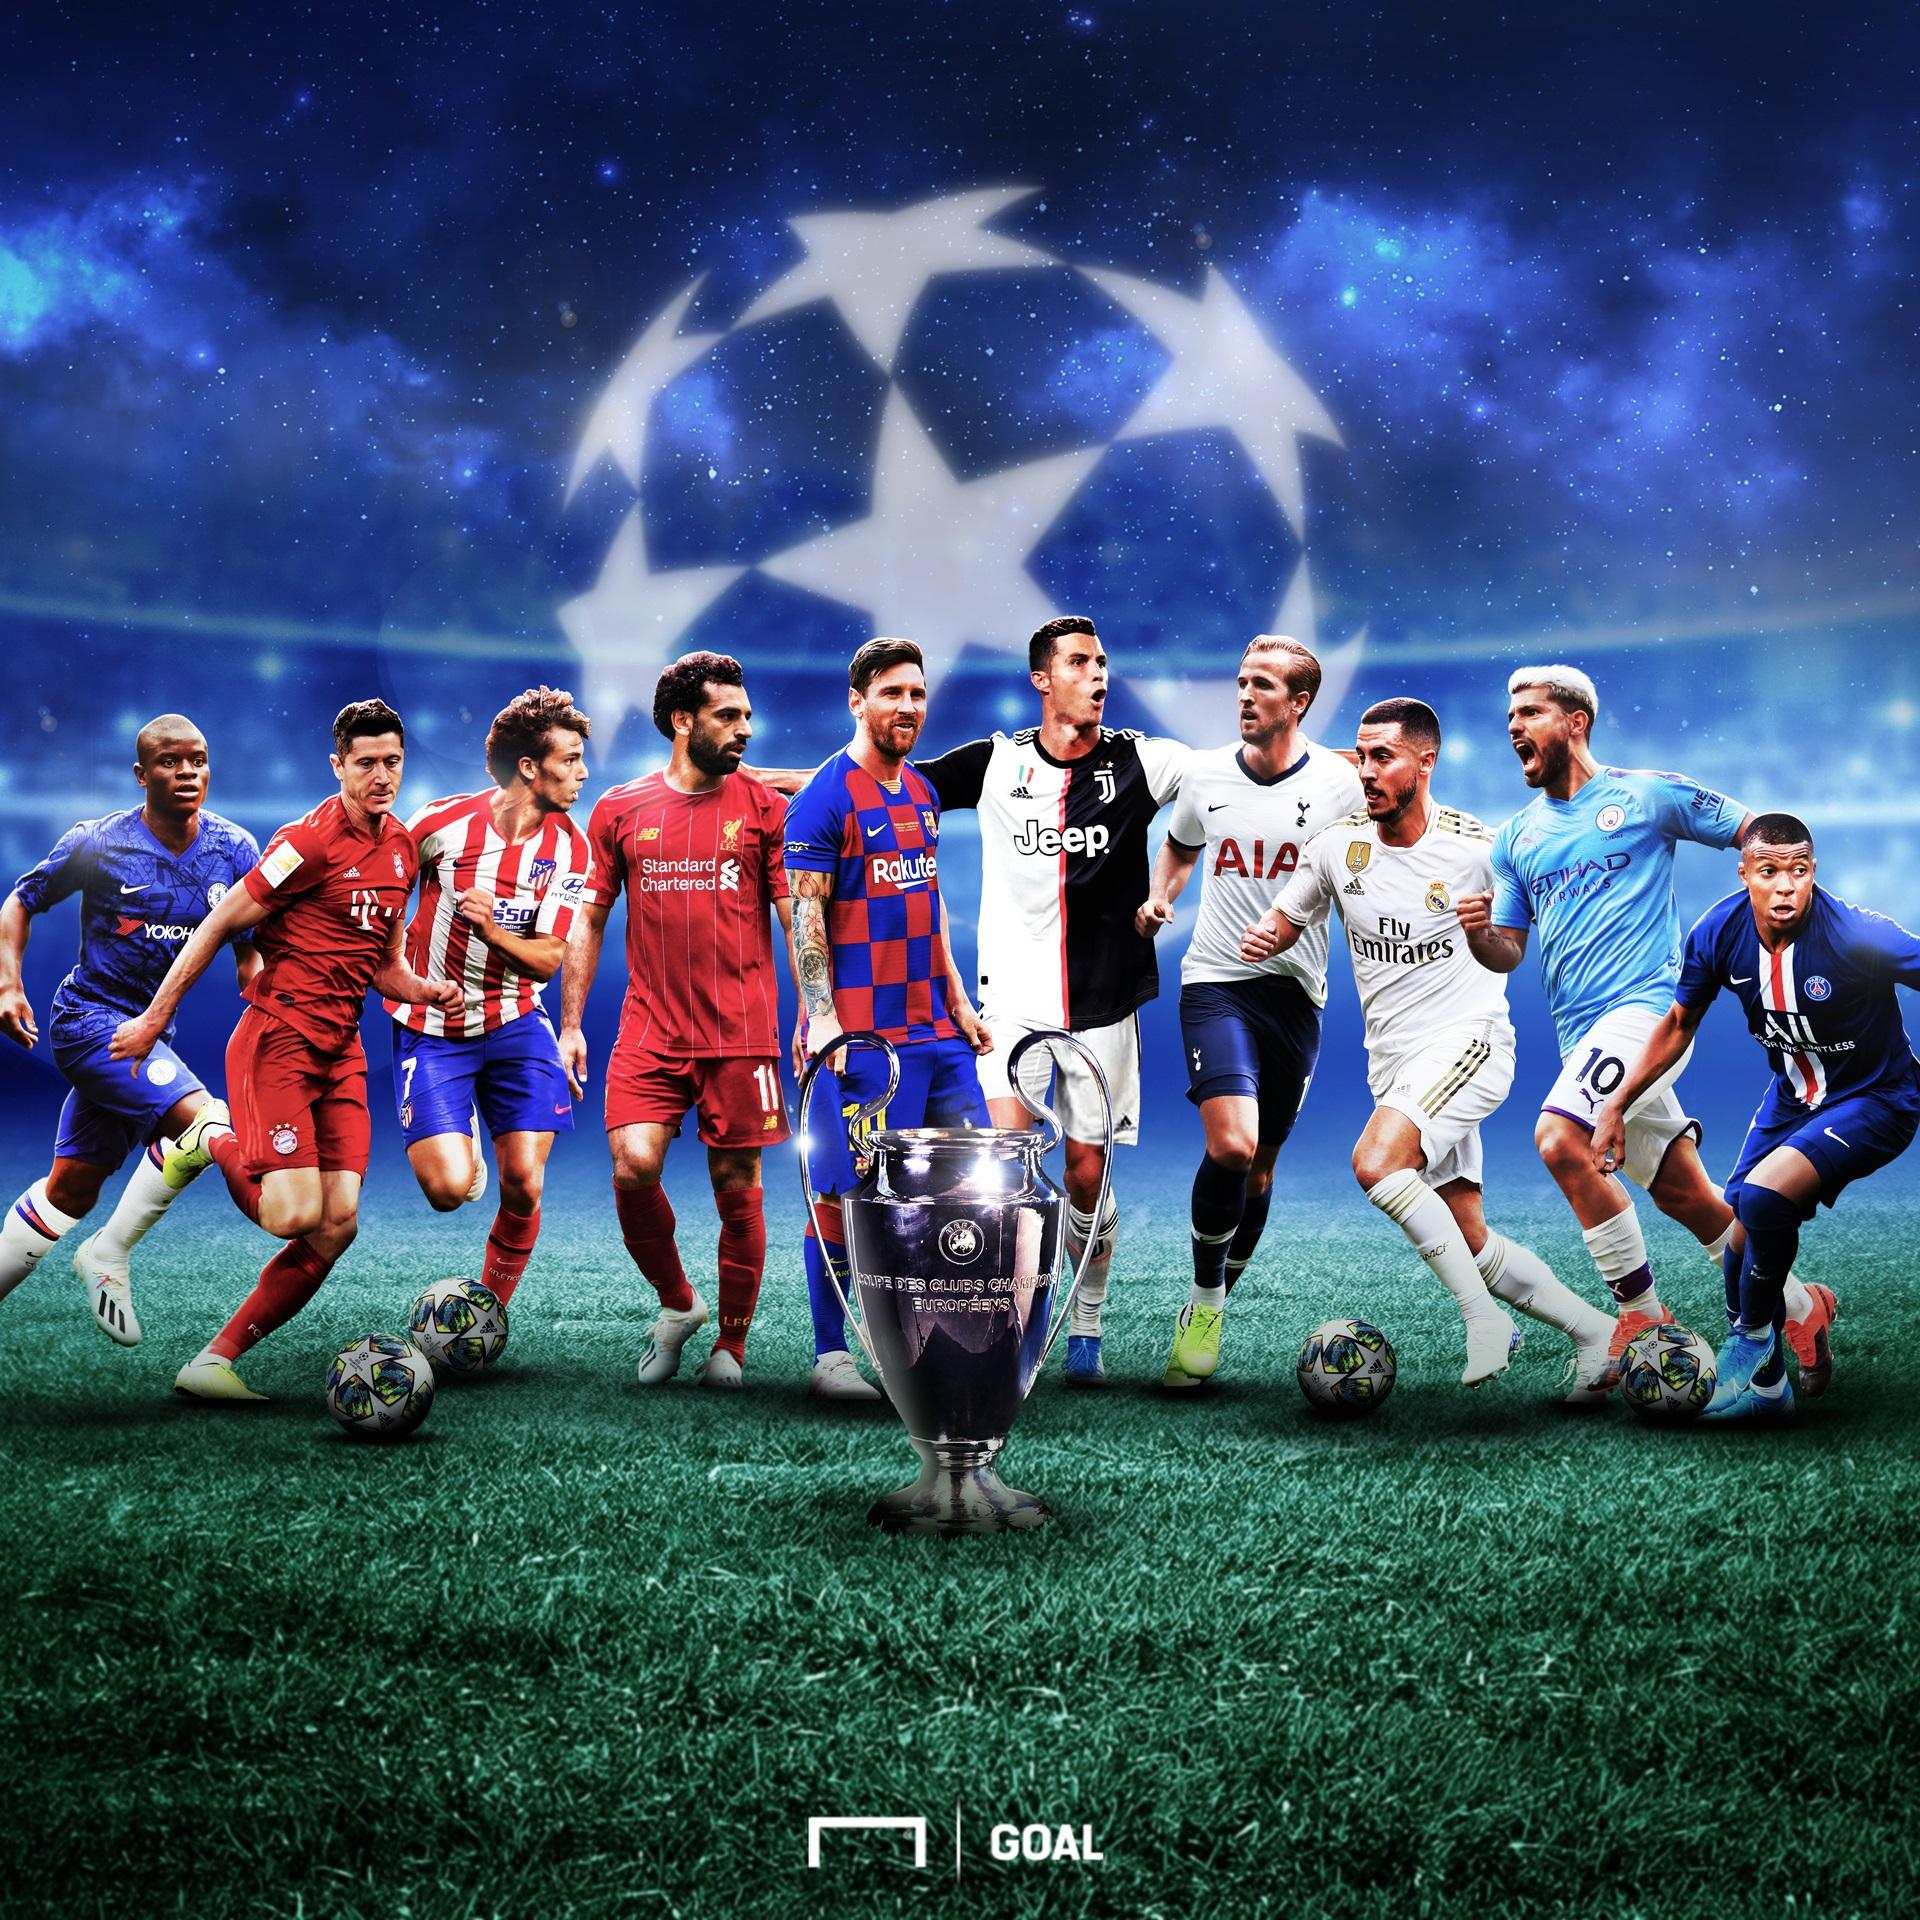 Champions League graphic